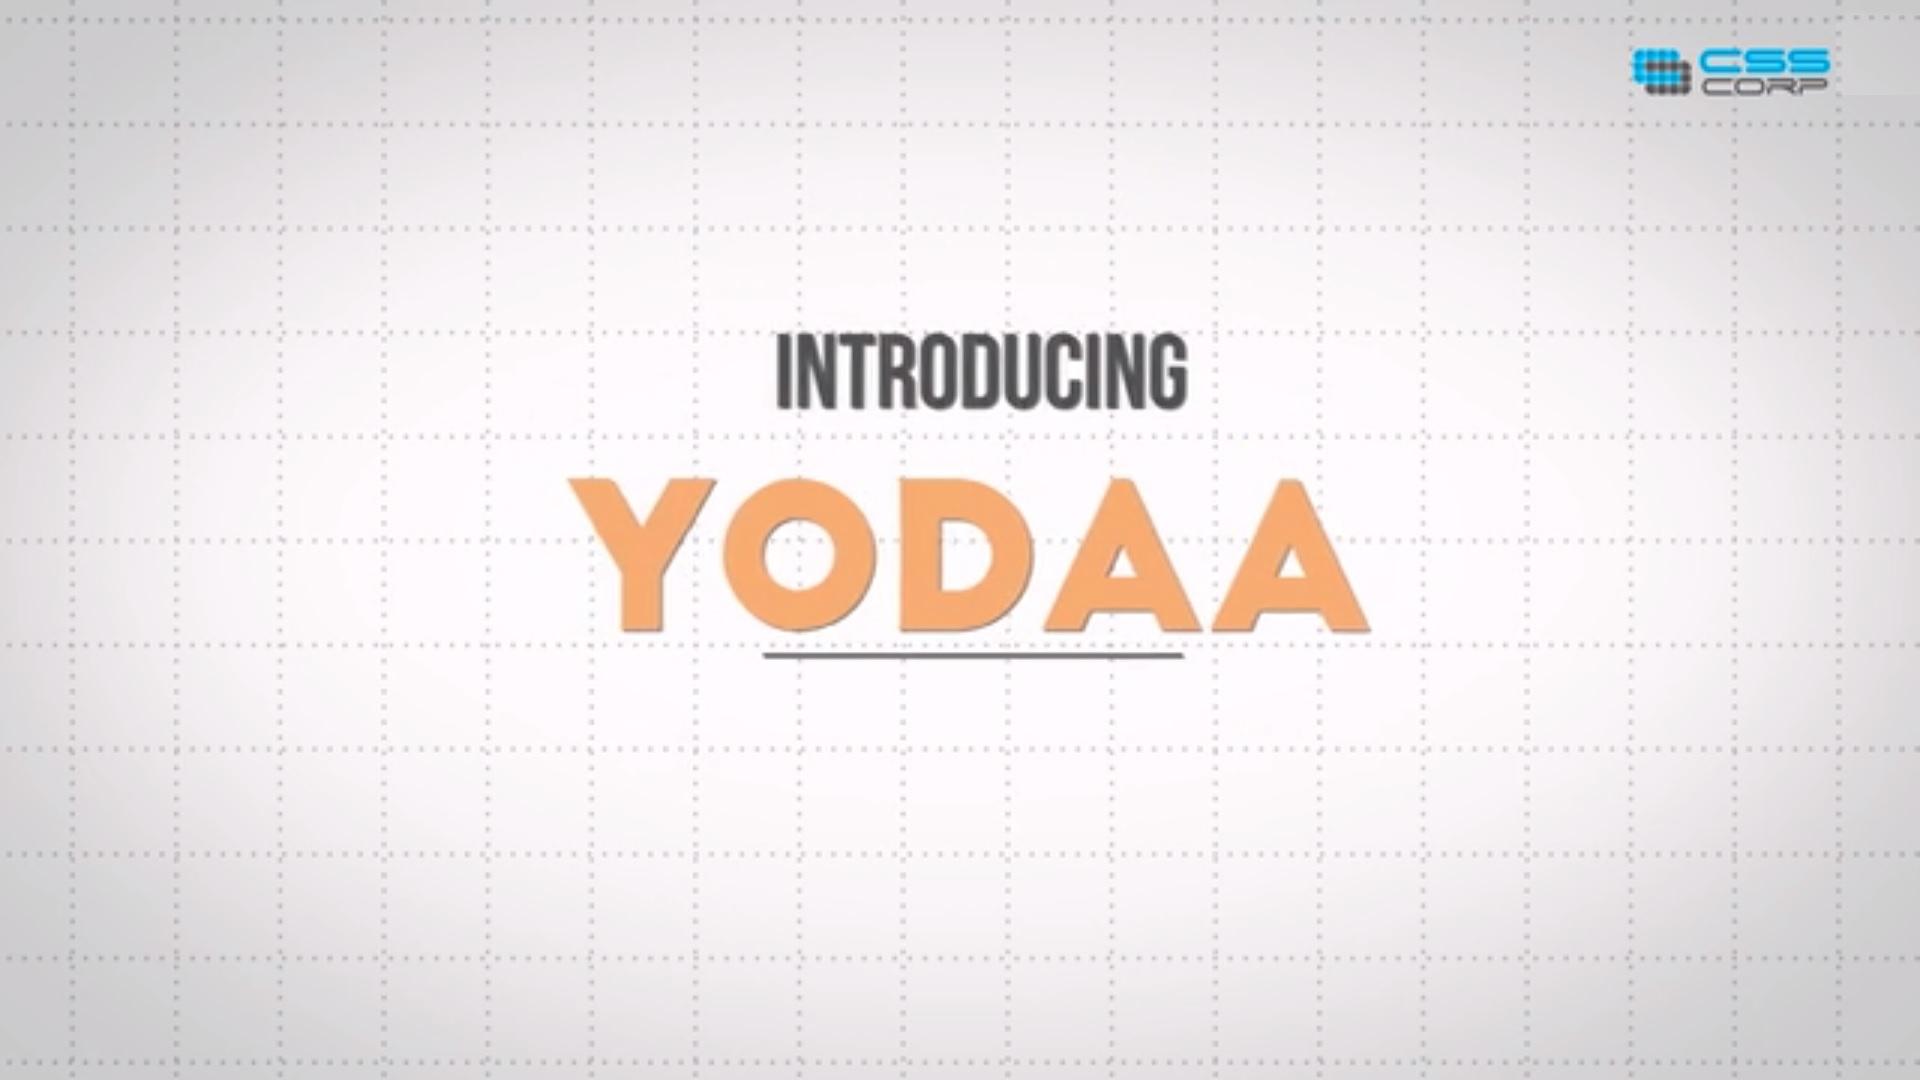 Introducing Yoda.jpg